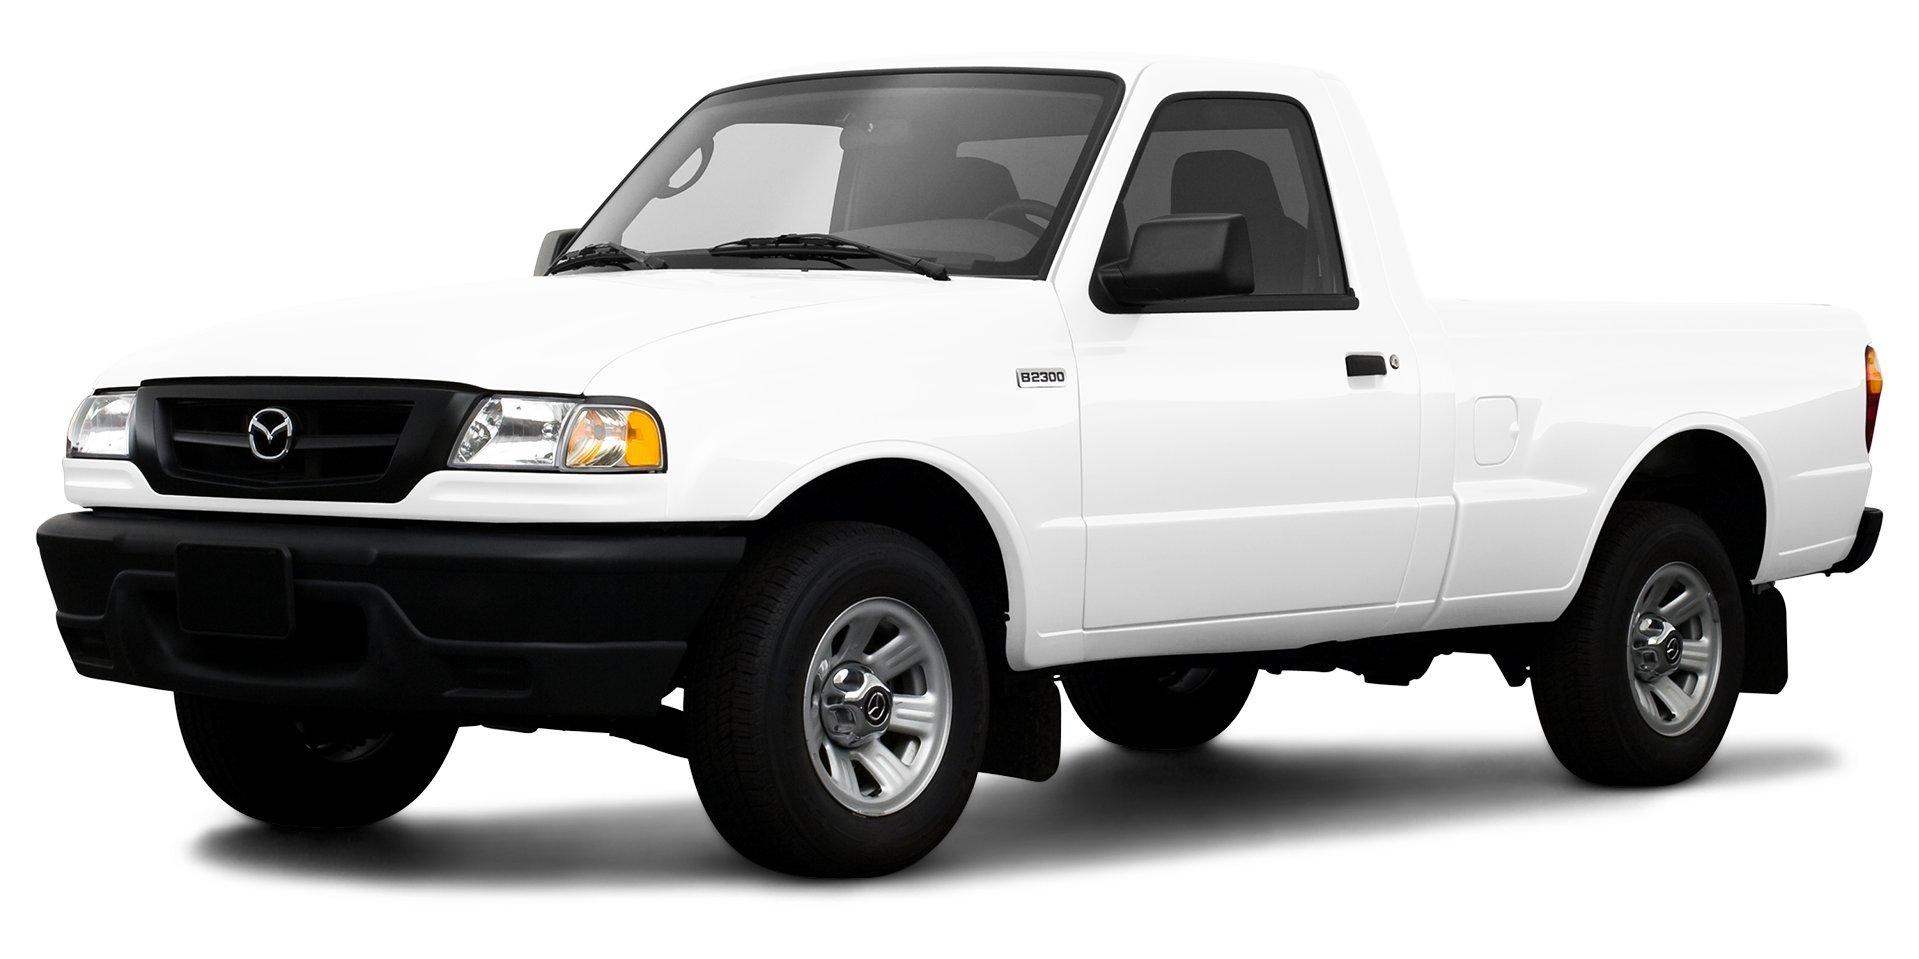 2009 mazda b4000 4 wheel drive plus4 cab automatic transmission